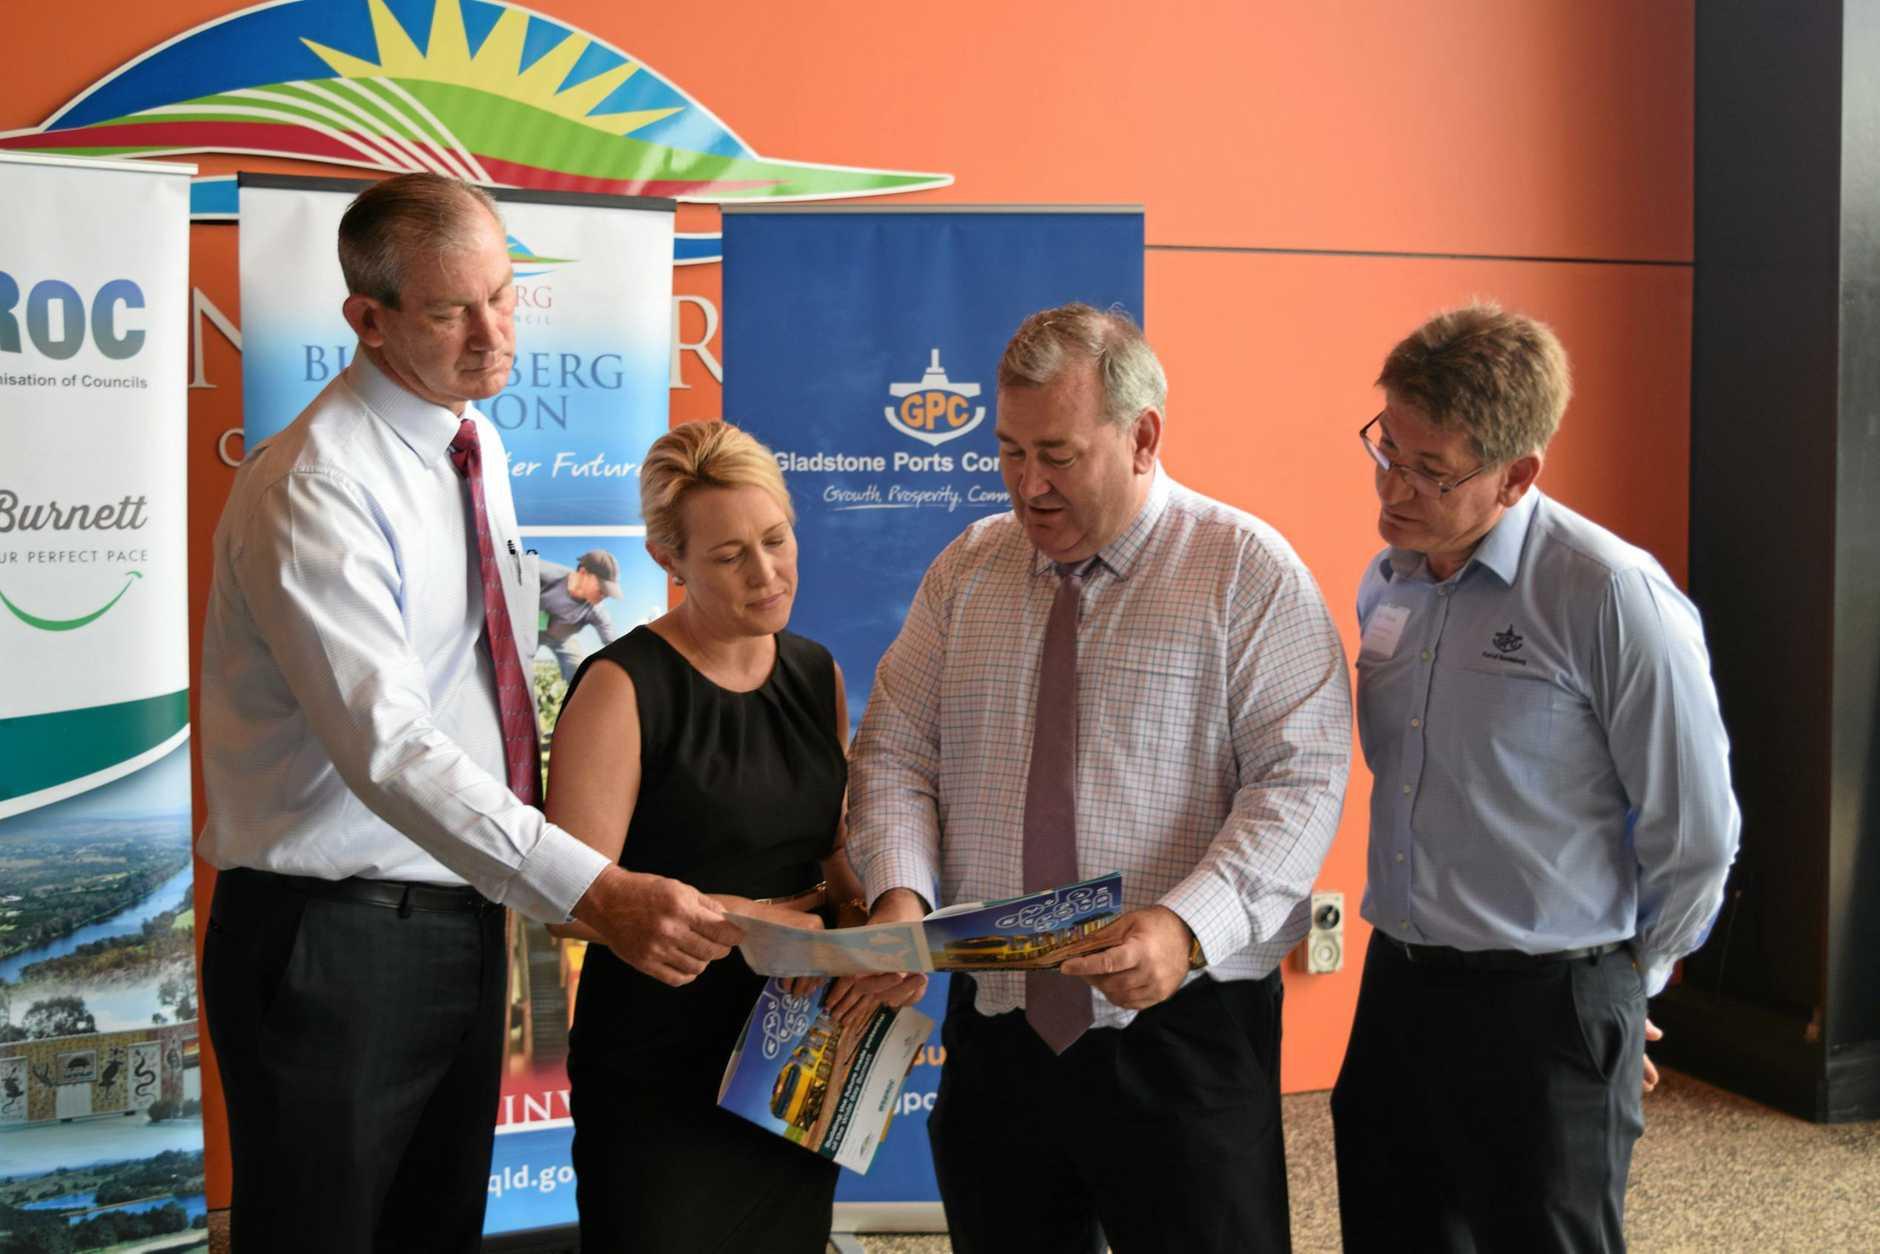 ECONOMIC FORUM: Gympie Mayor Mick Curran (Chair of WBBROC), North Burnett Mayor Rachel Chambers, Bundaberg Mayor Jack Dempsey and Manager of Bundaberg Port (GPC) Jason Pascoe.